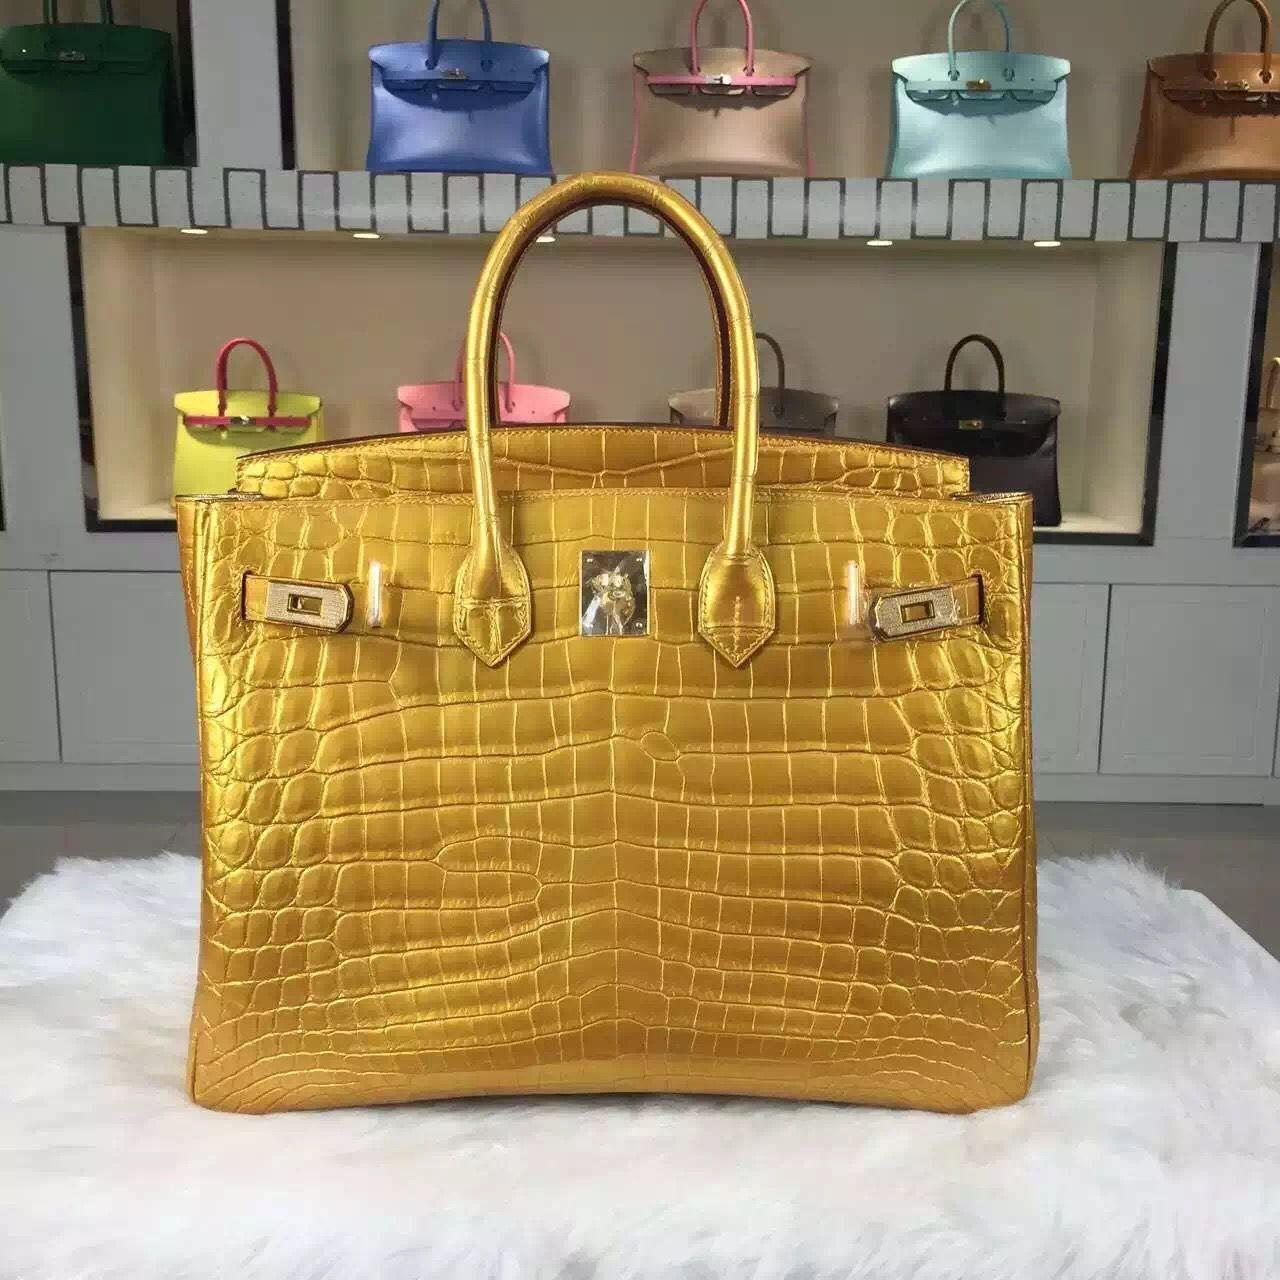 0d503dd103 Brand  Hermes  Style  Birkin Bag35cm  Material Crocodile Leather (HCP  original leather) Color Gold   Hardware  silver